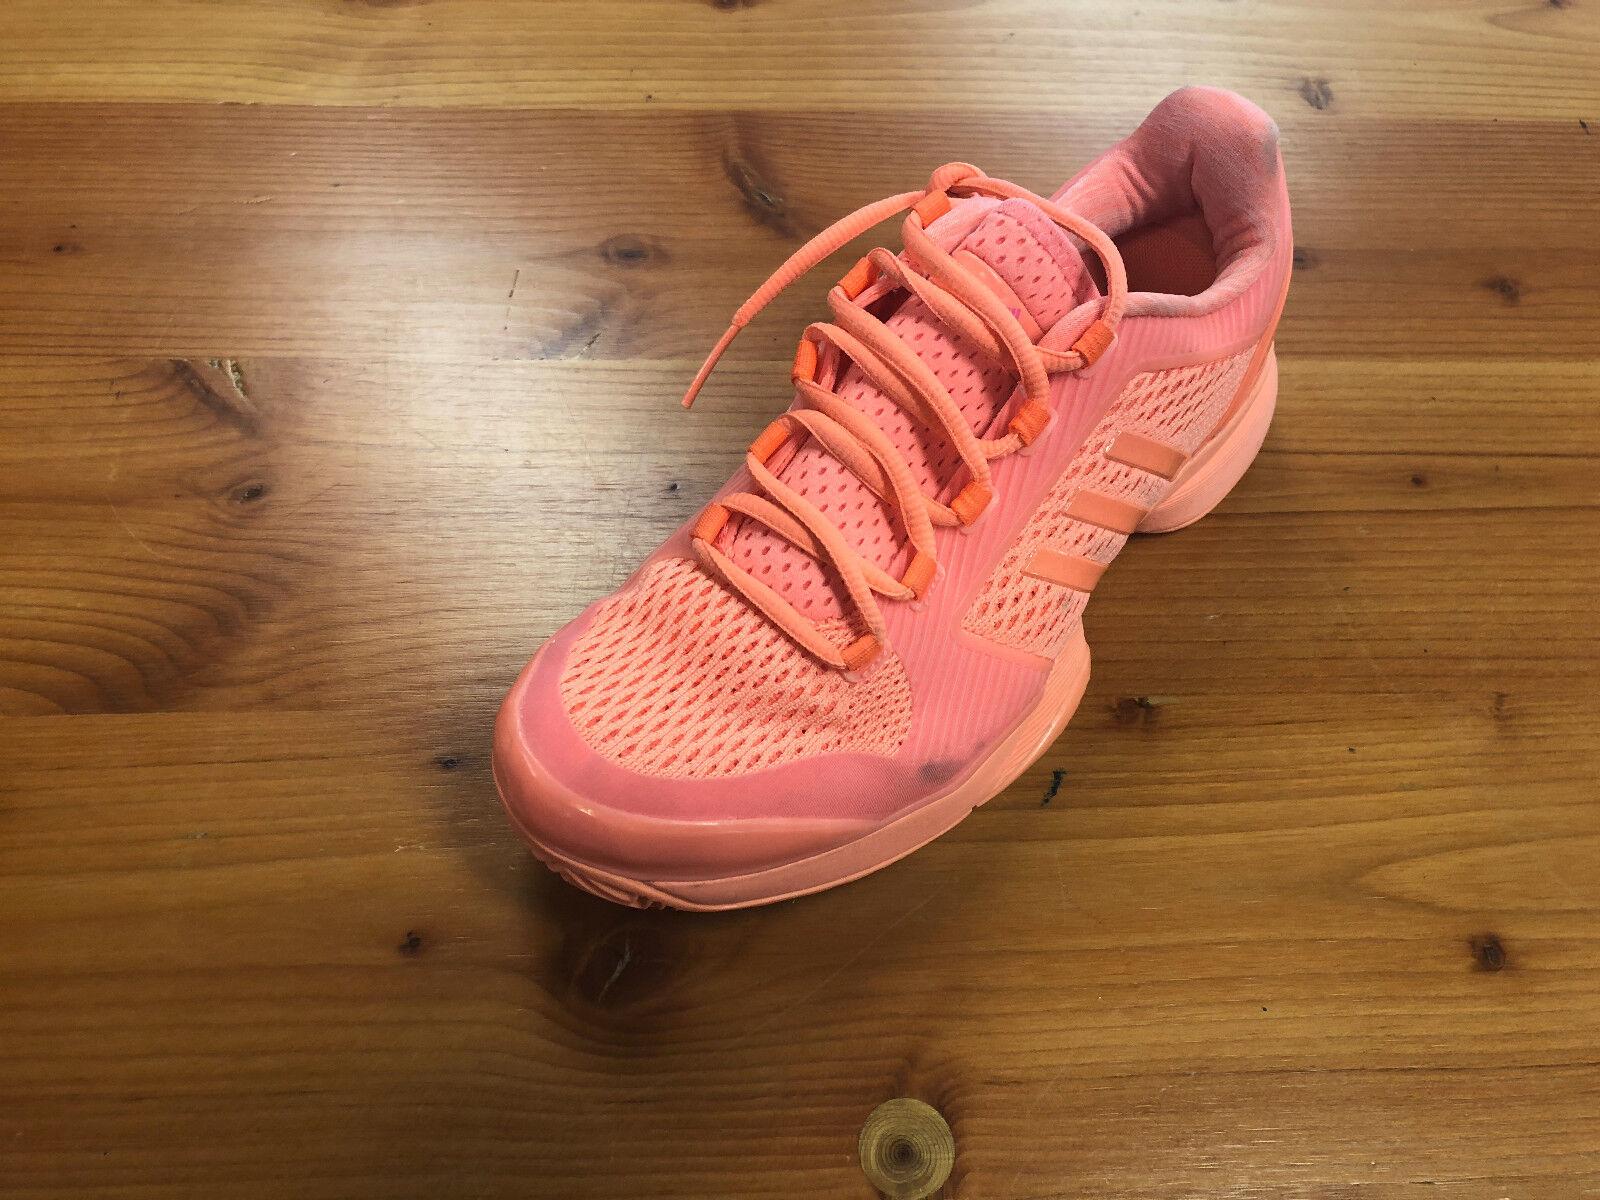 Women's Adidas ASMC Barricade Preowned Tennis shoes Size 5